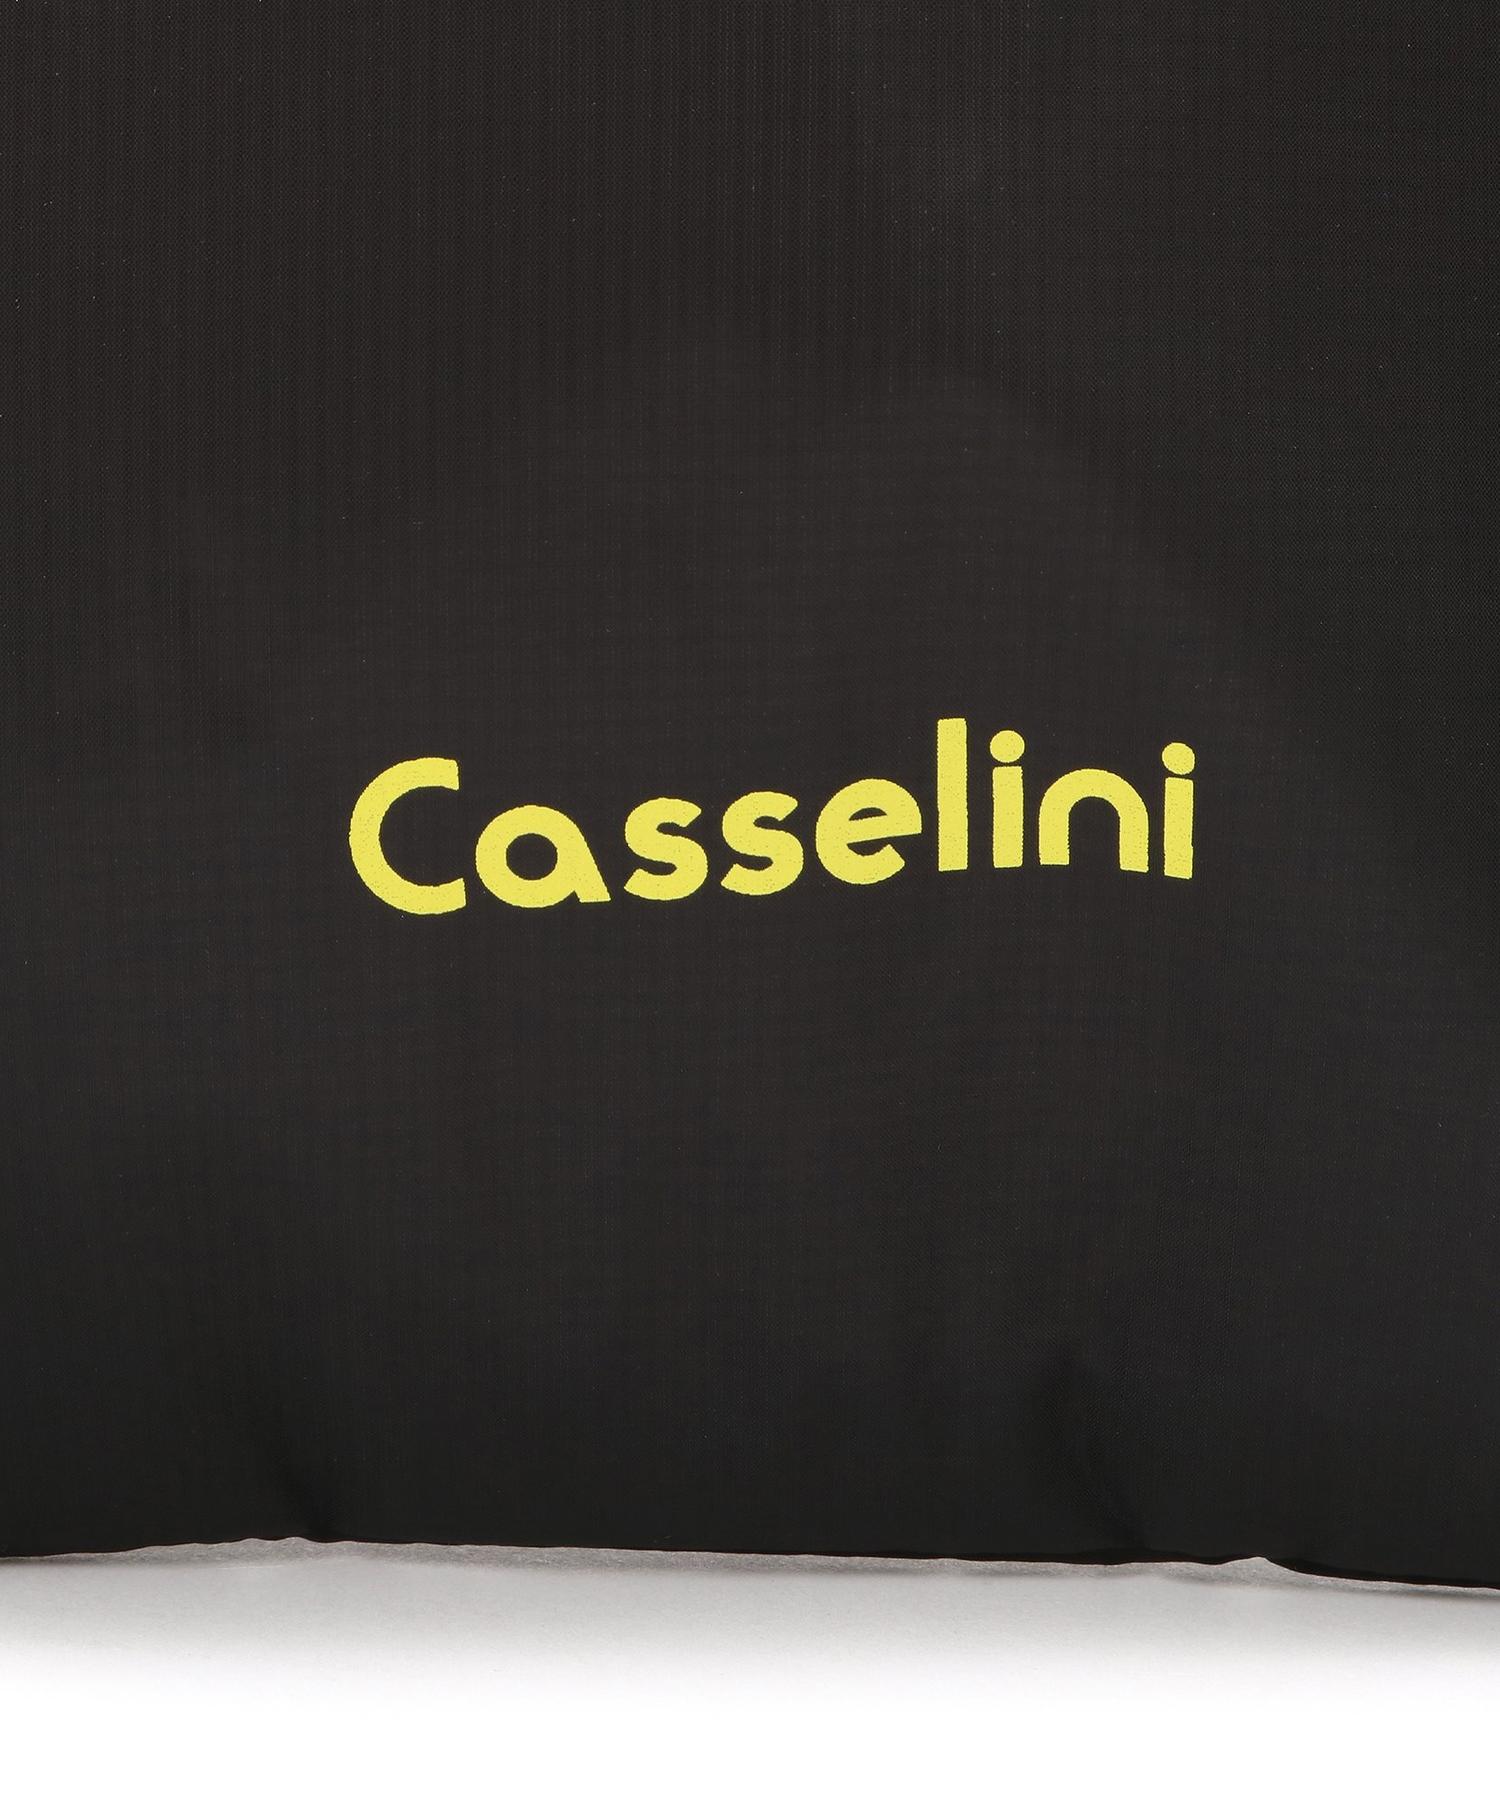 Daily russet(デイリー ラシット) 【casselini / キャセリーニ】コンビニエコバッグ